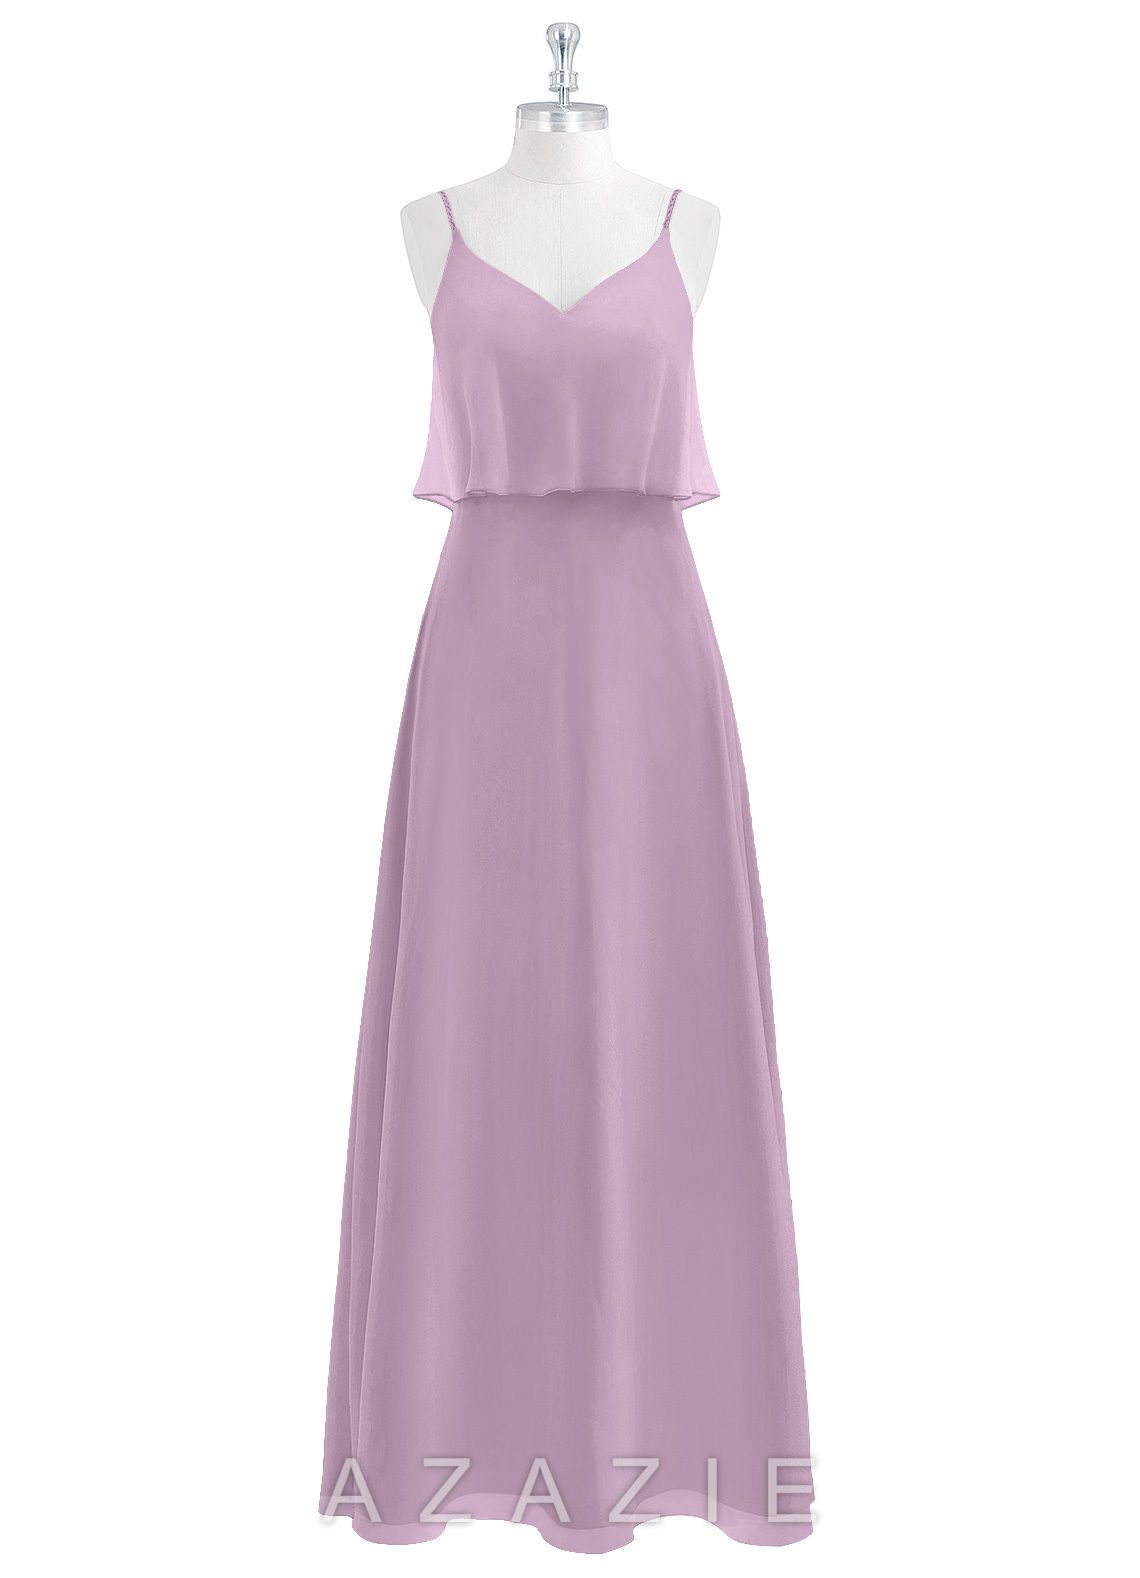 aeece262e47 Azazie Desiree Bridesmaid Dress - Wisteria